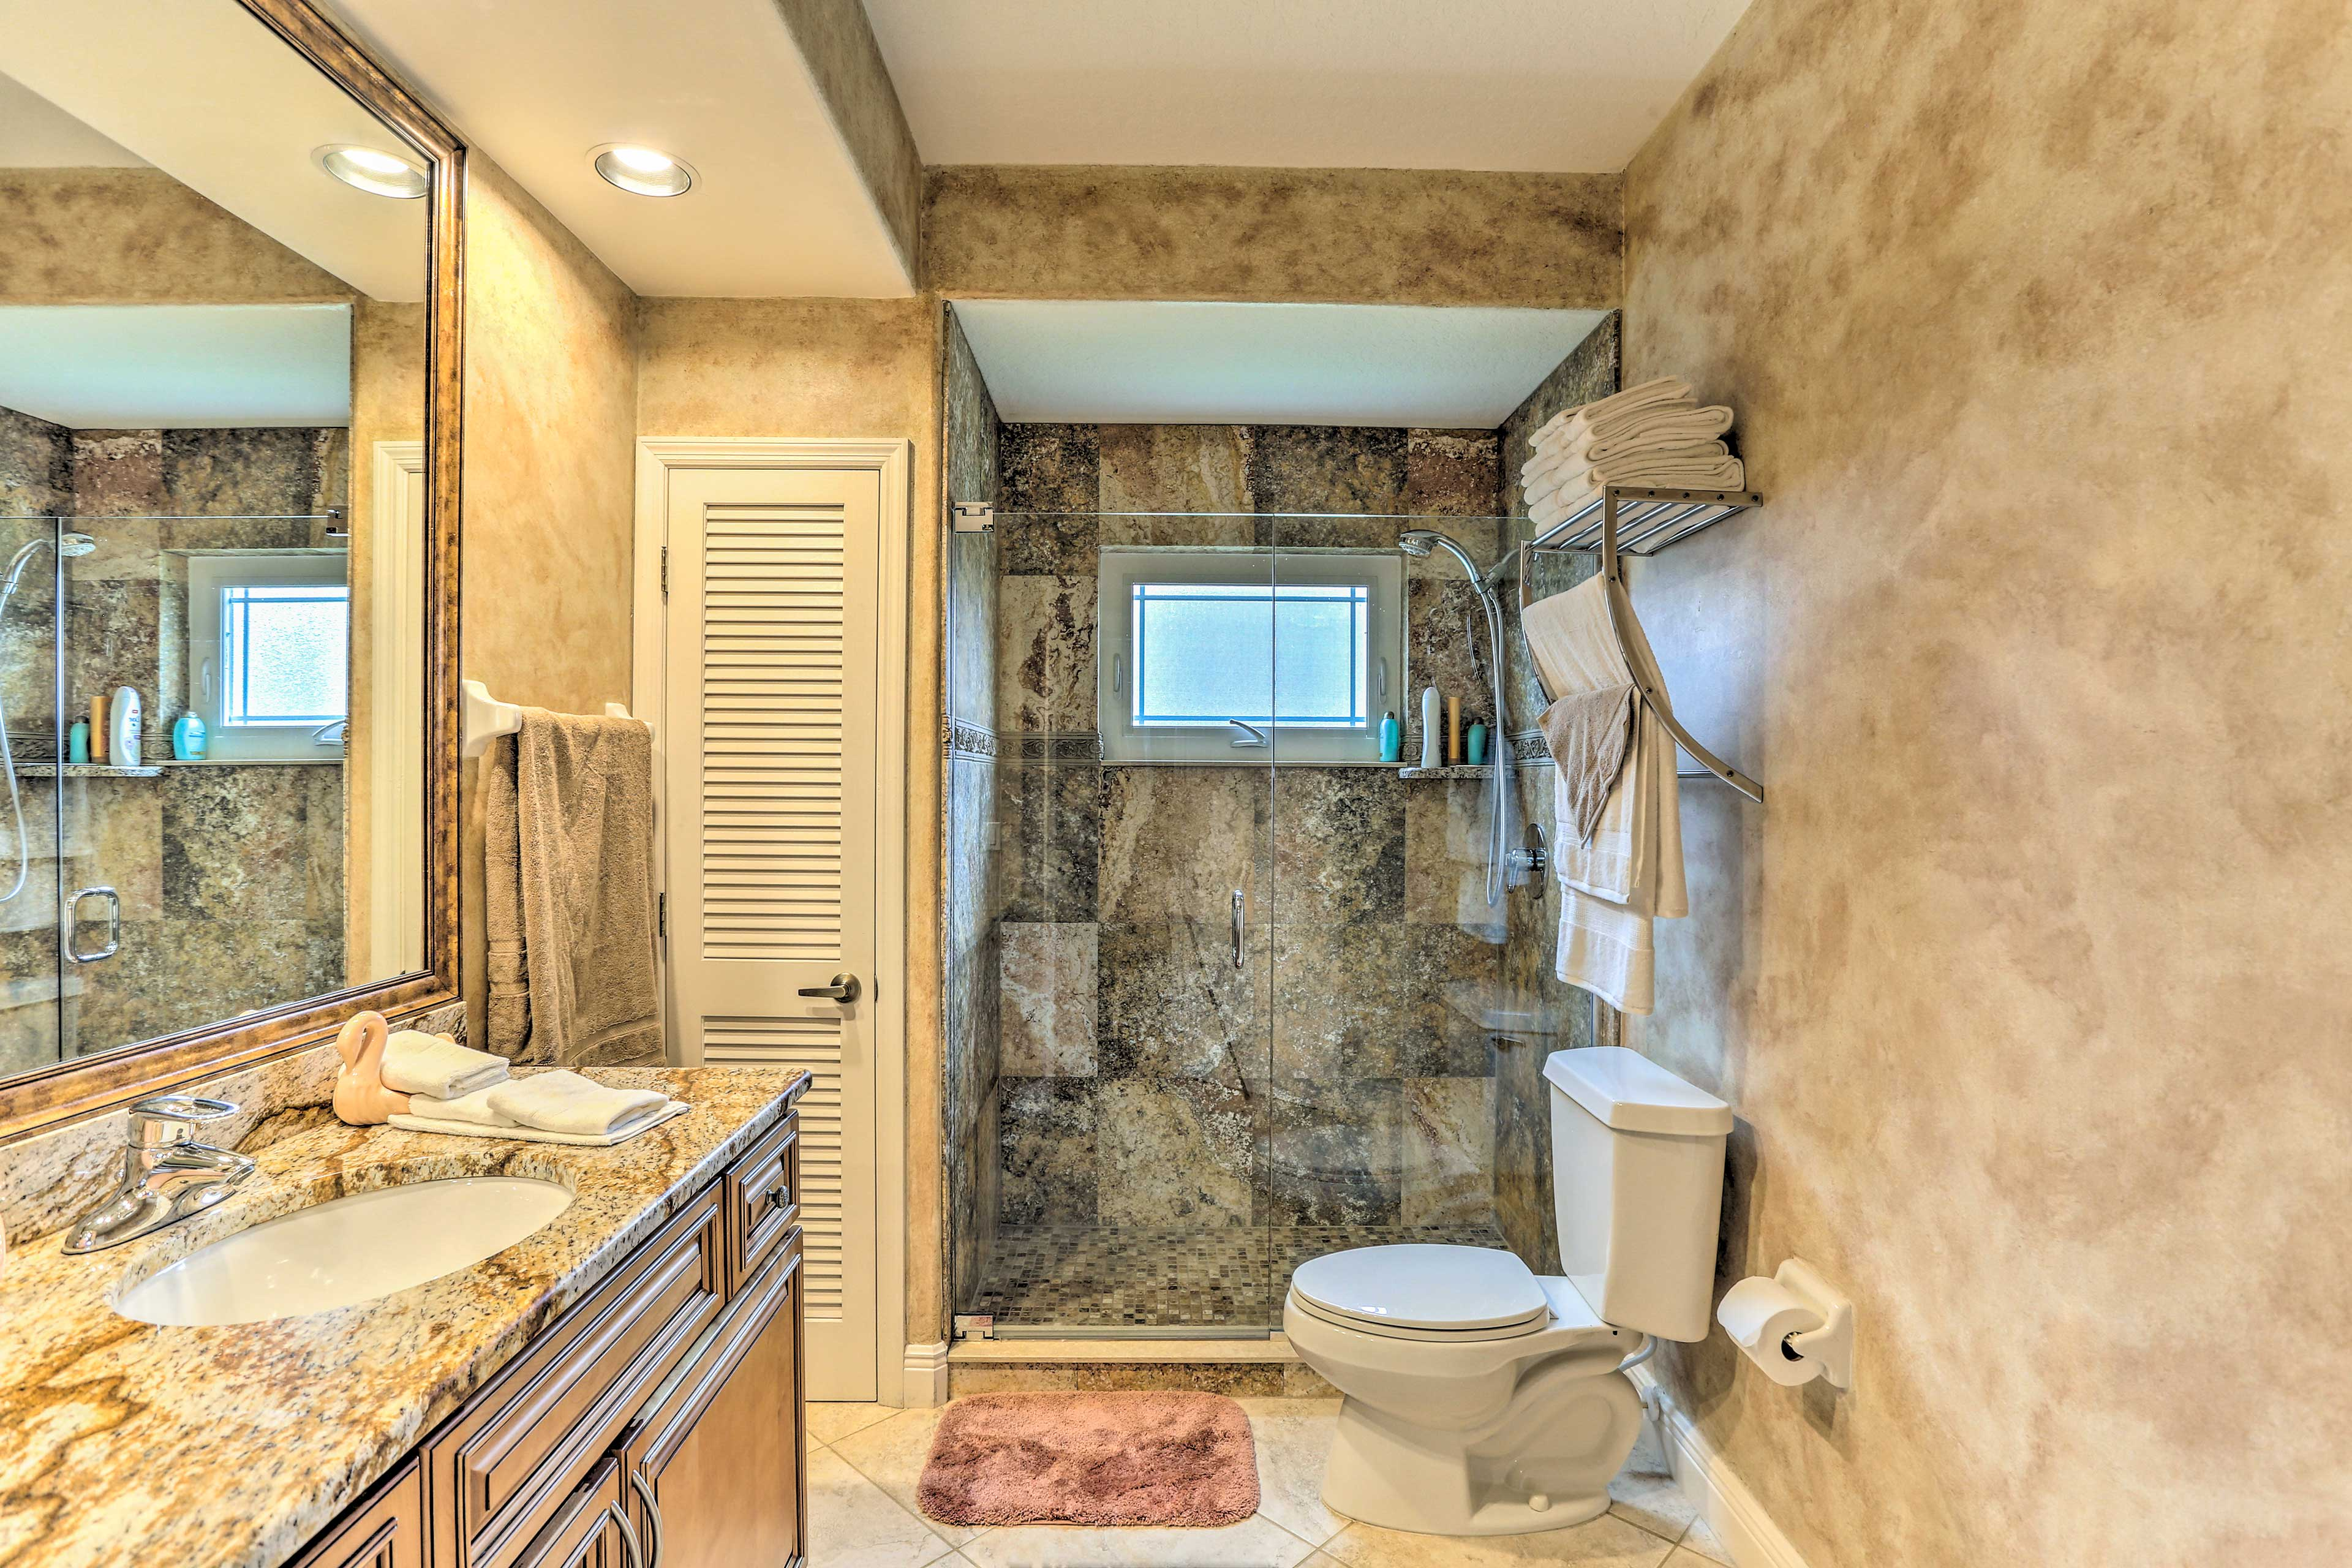 This full bathroom boasts custom tile work and a walk-in shower.